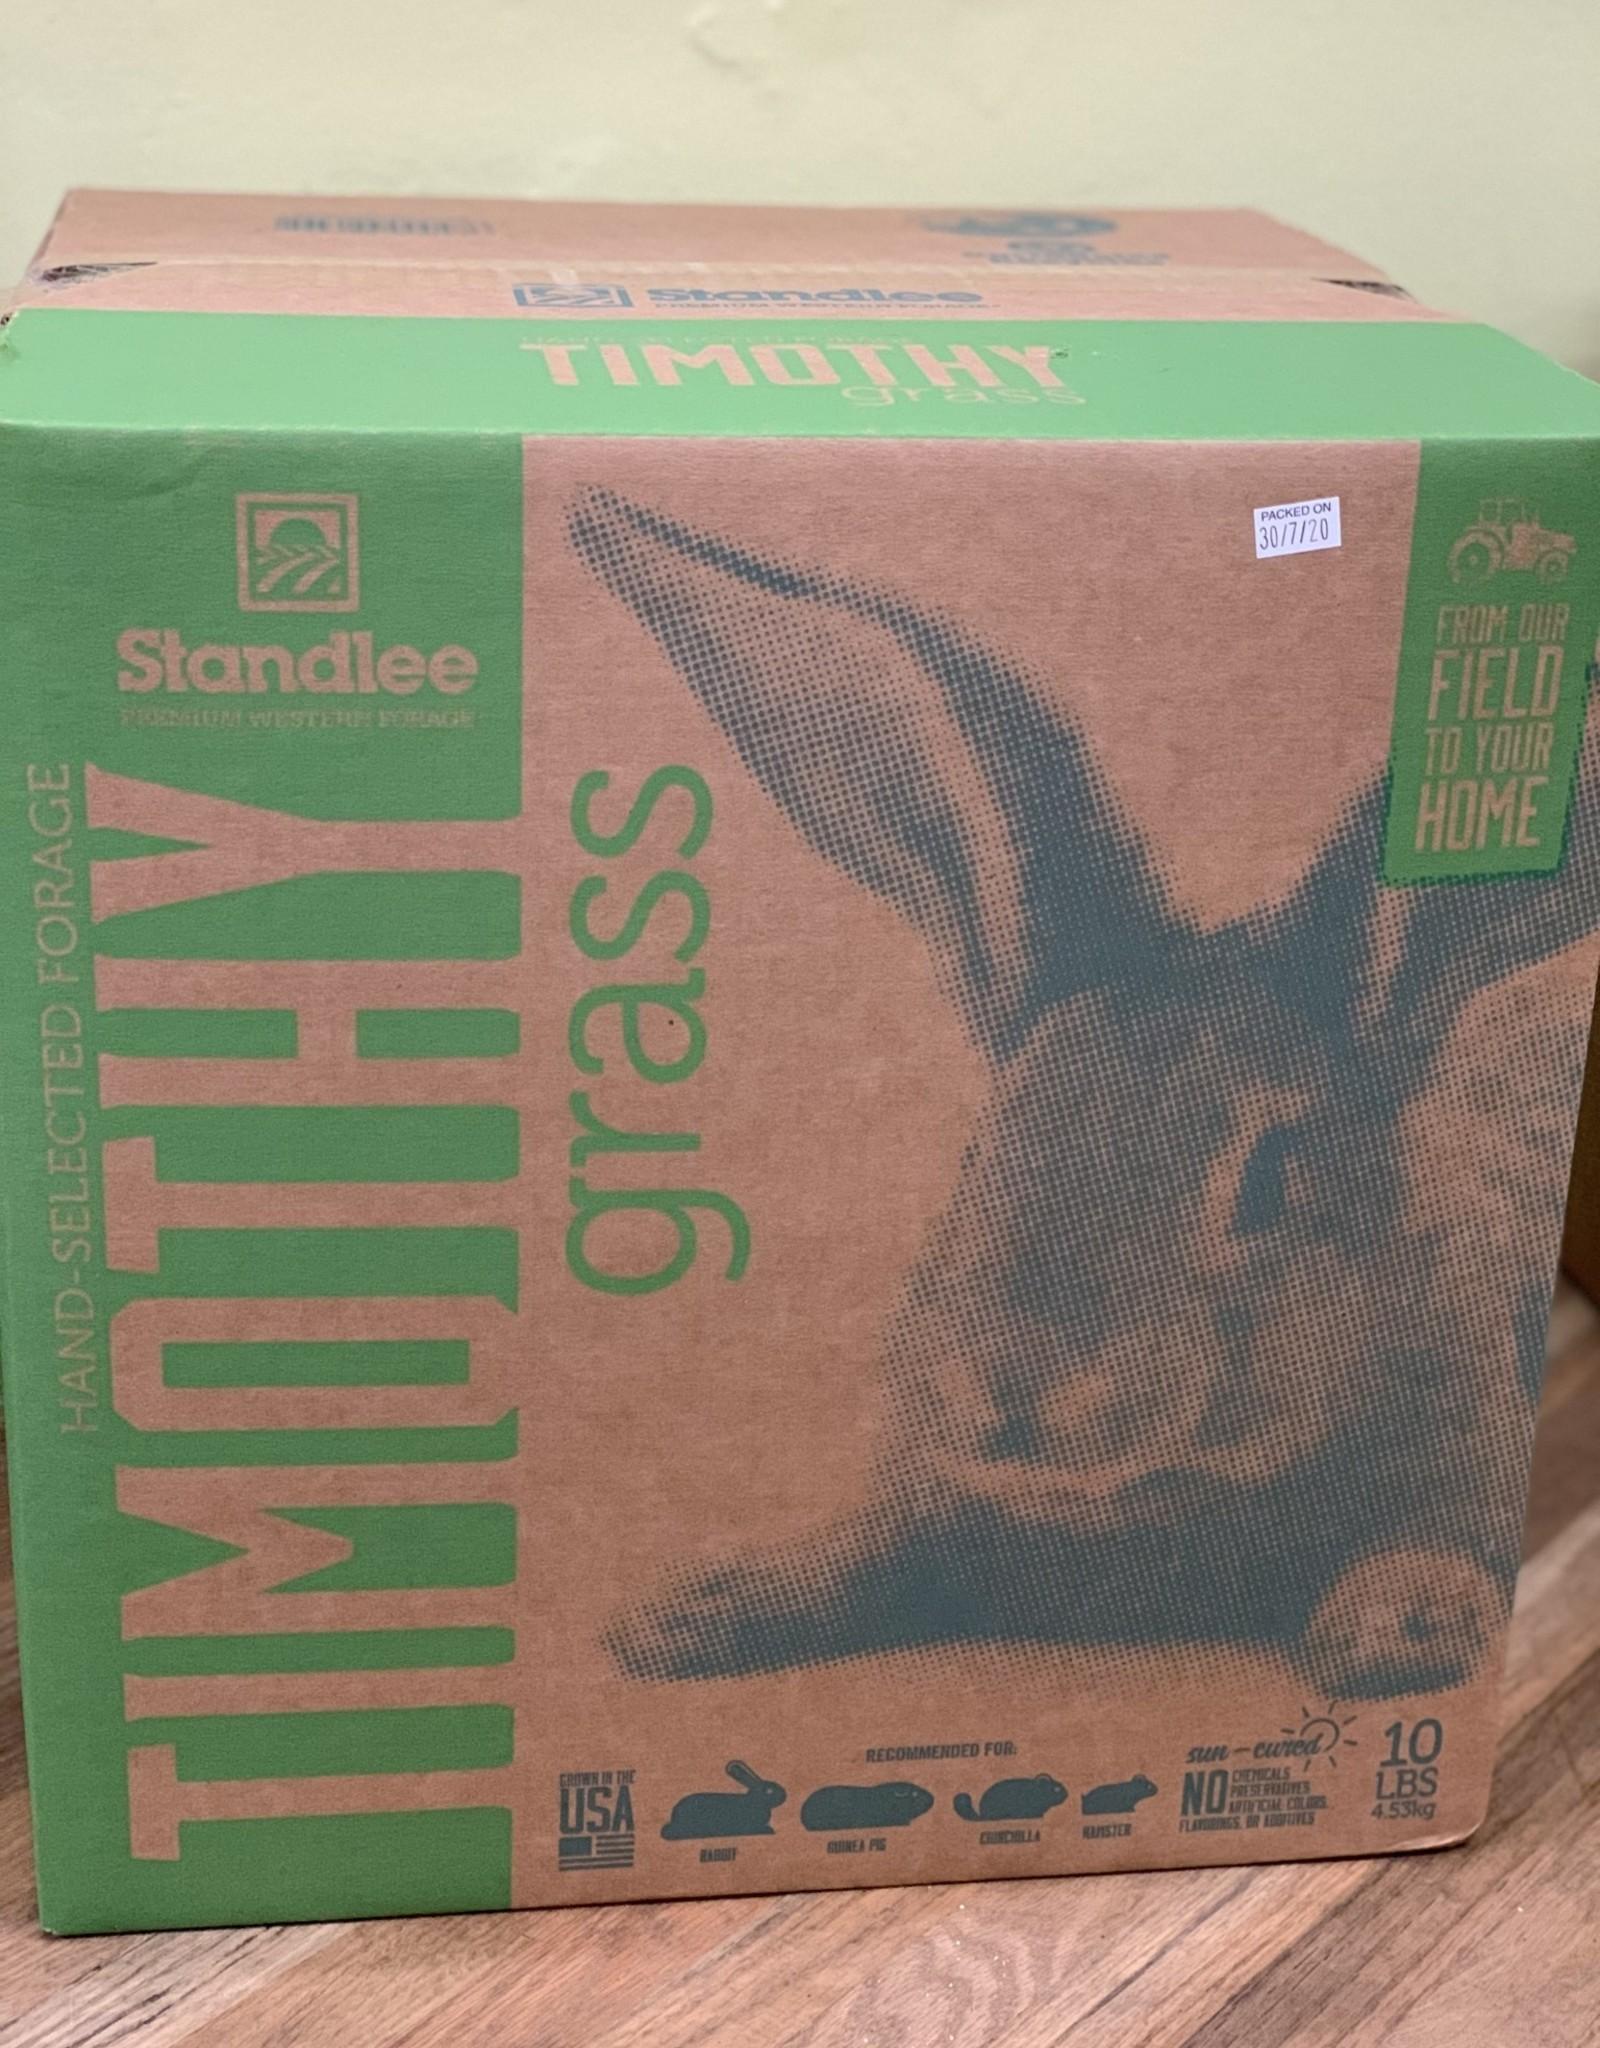 Standlee Premium Western Forage Timothy Hay 10lbs Box